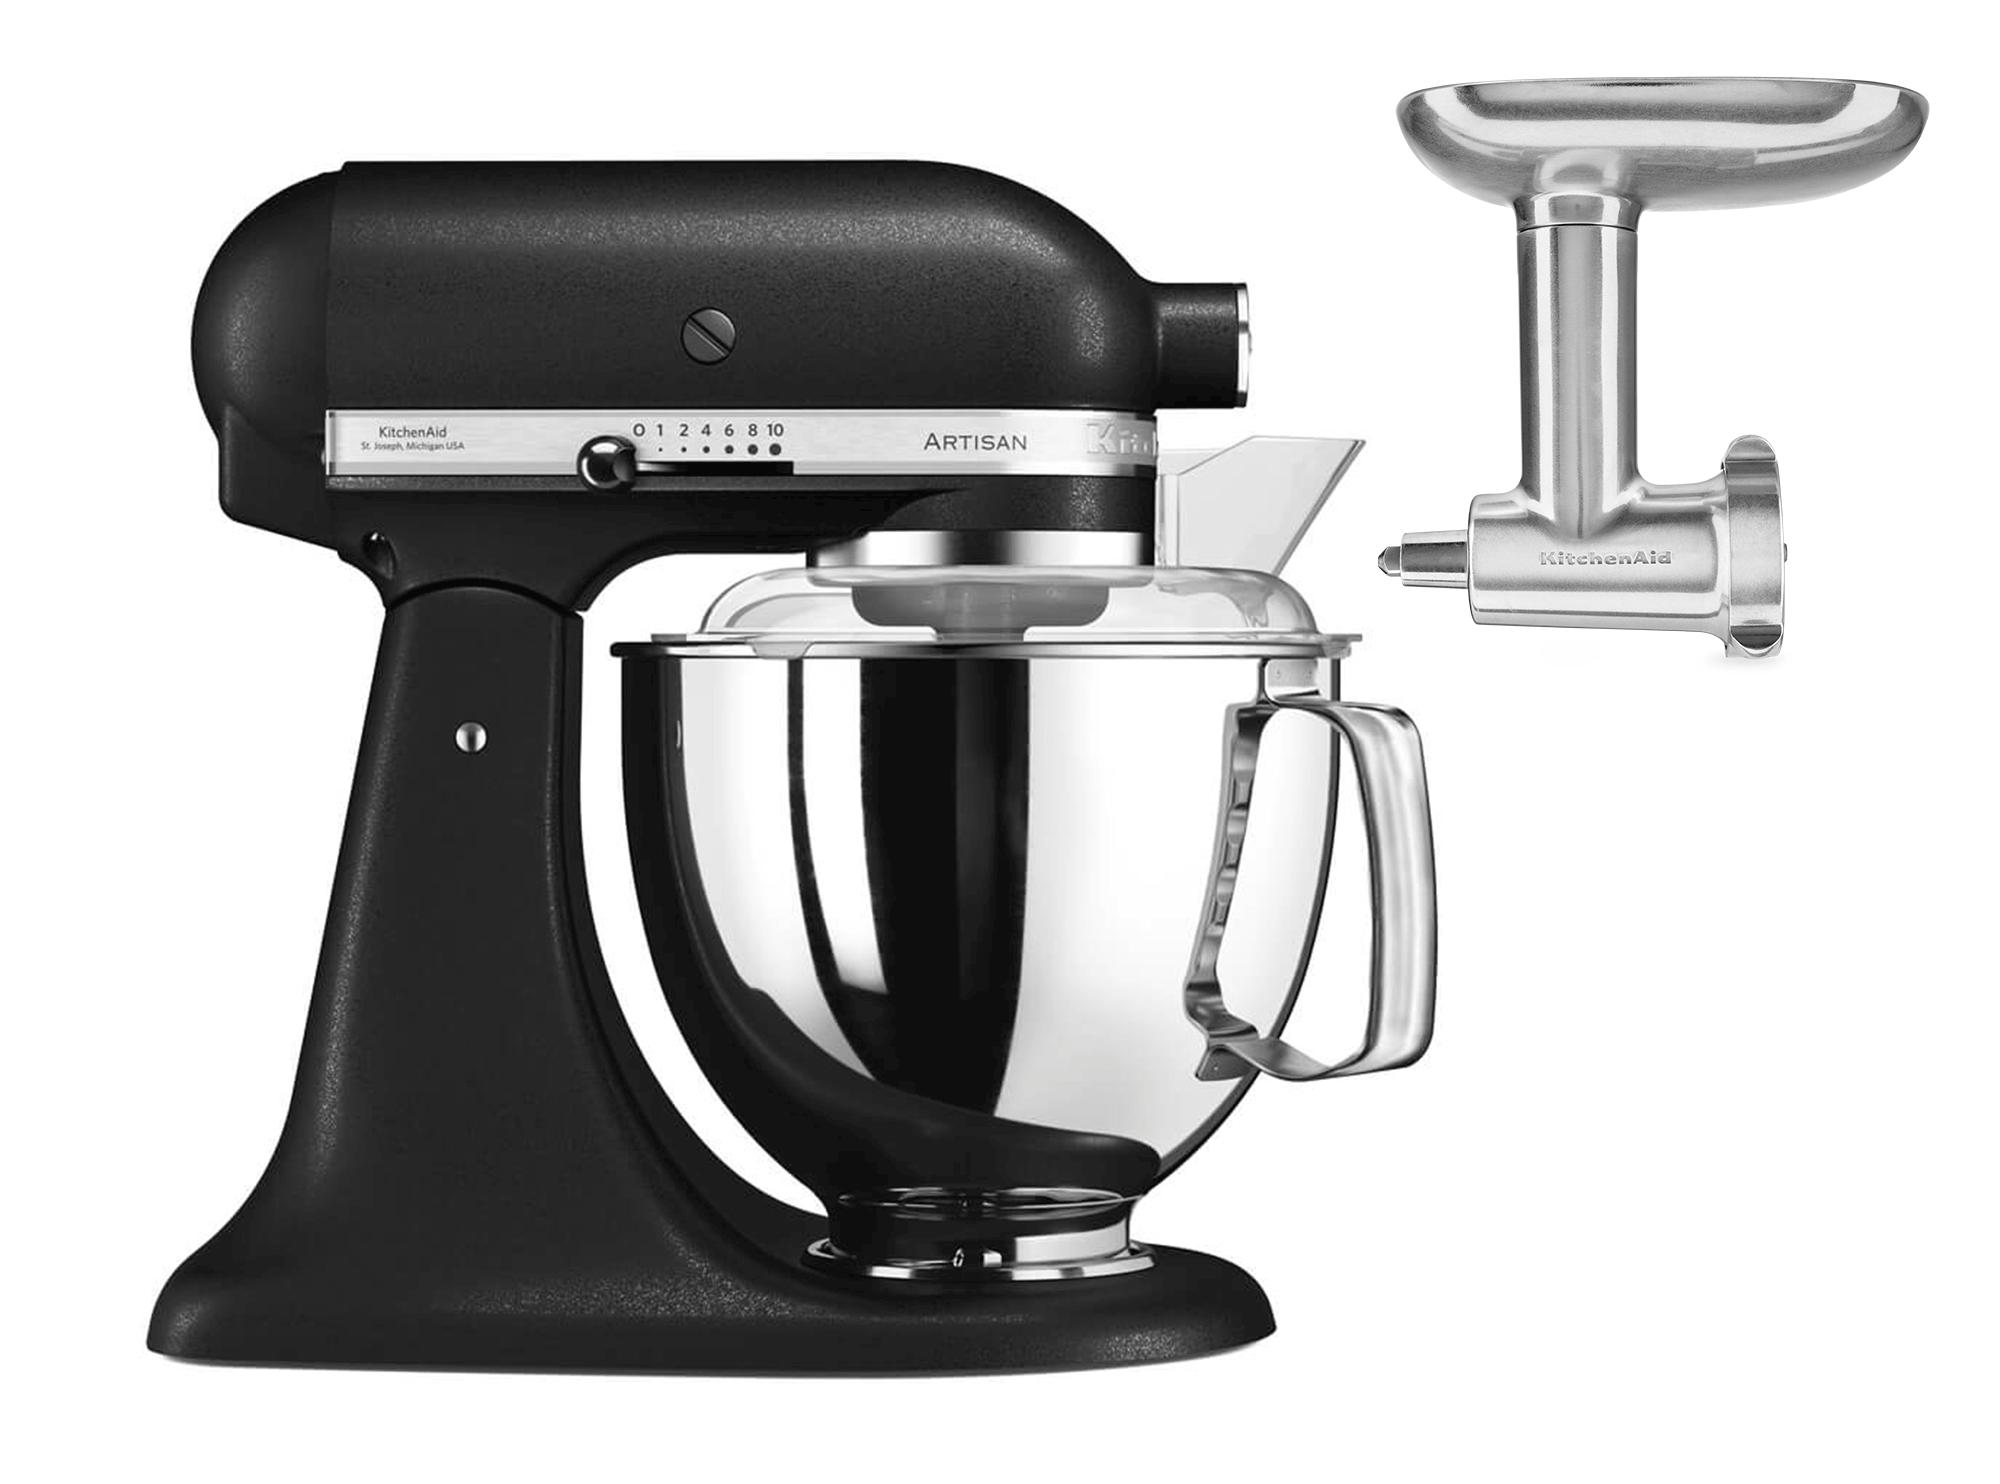 KitchenAid Artisan KSM175PSEBK Svart Lava + Kjøttkvern Metall